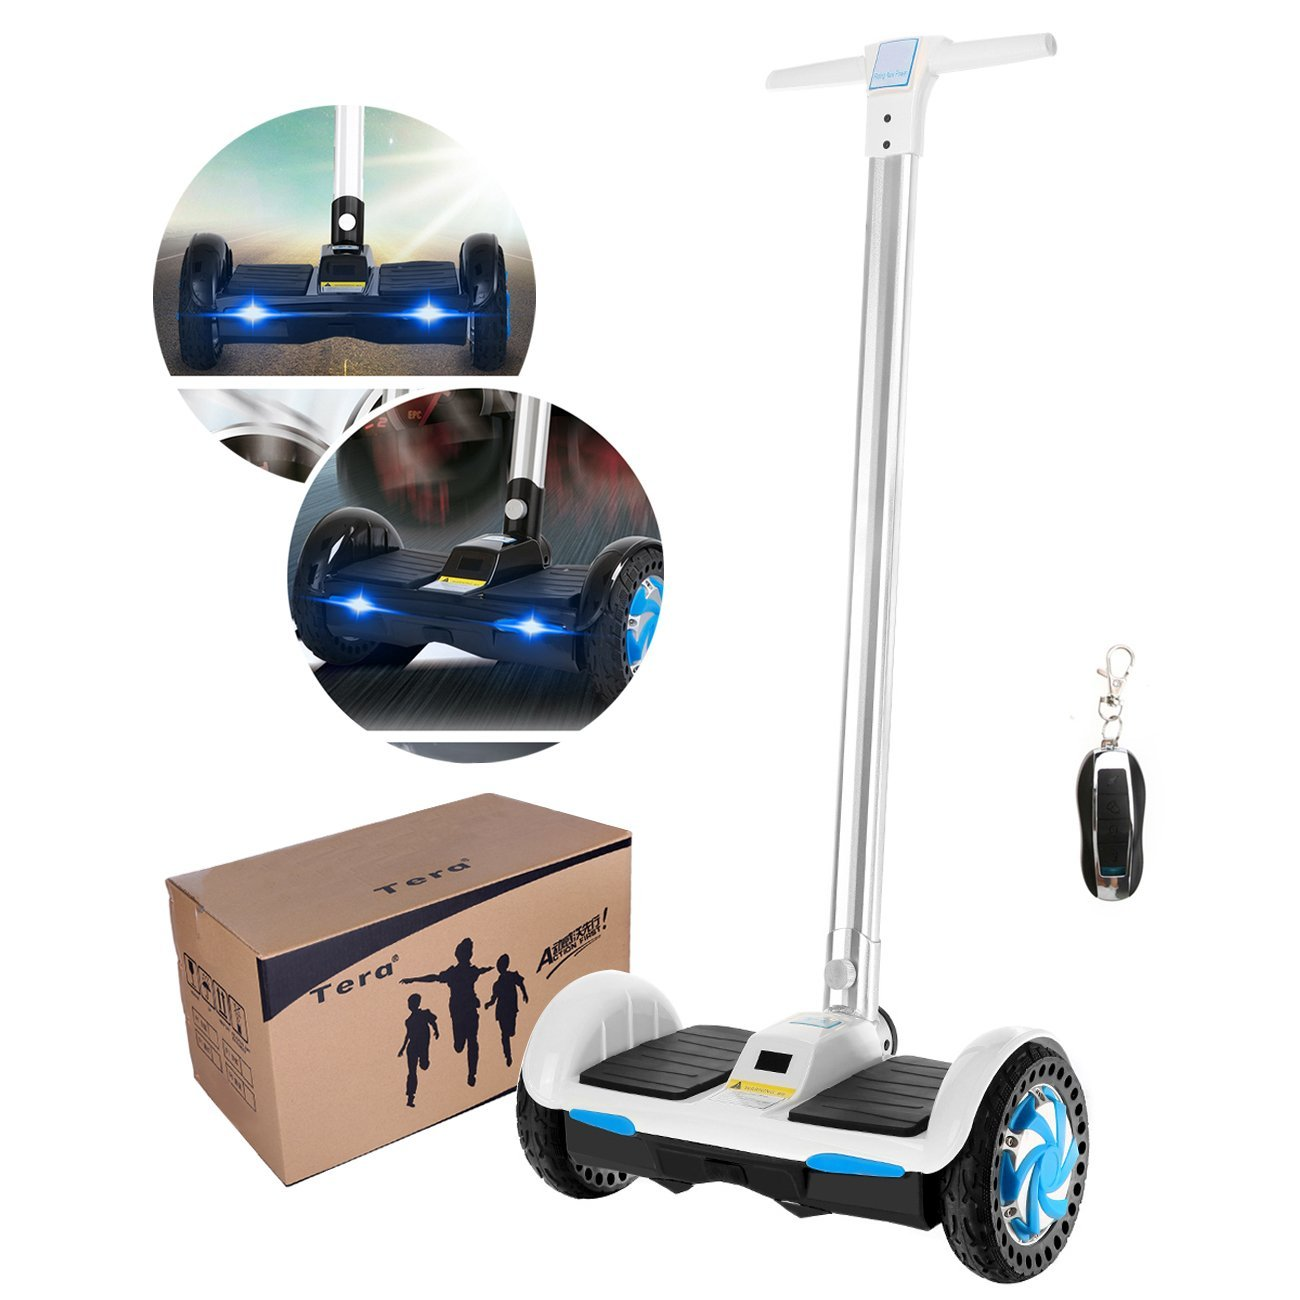 tera f1 smart wheels. Black Bedroom Furniture Sets. Home Design Ideas